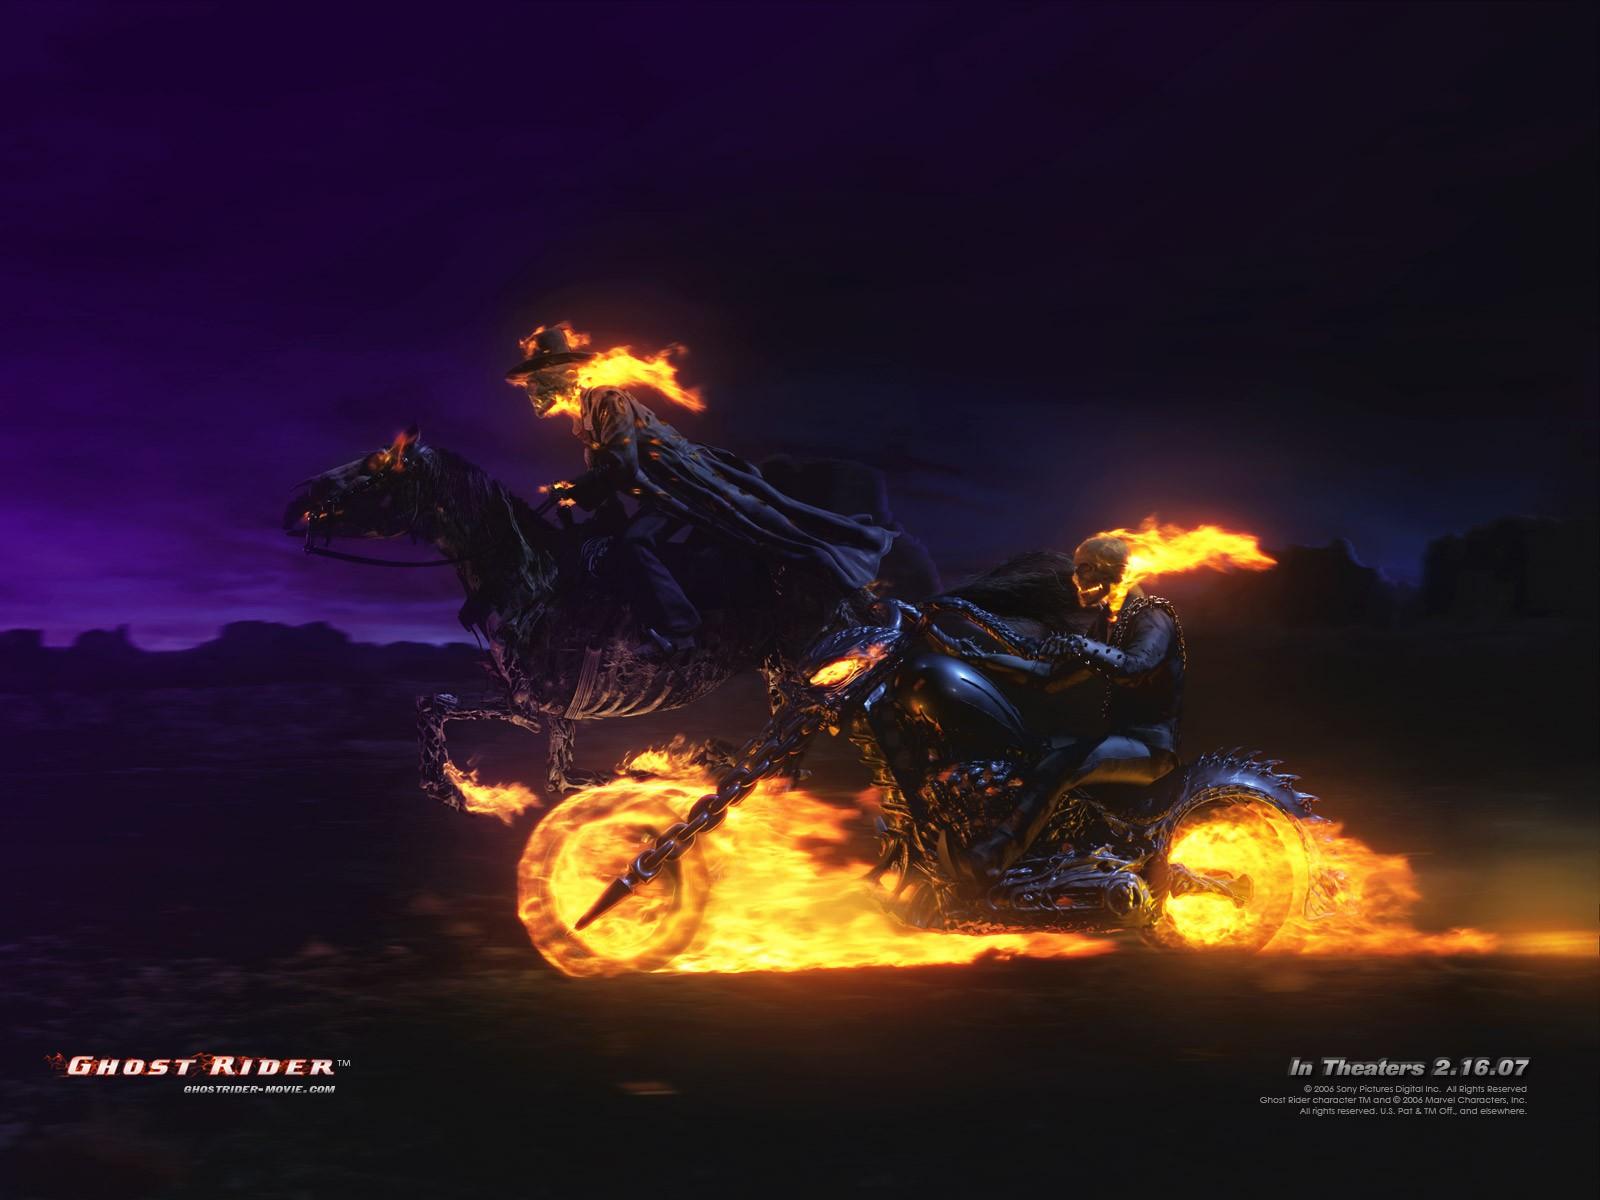 Ghost Rider 9 Wallpaper Hd 3D 1600x1200